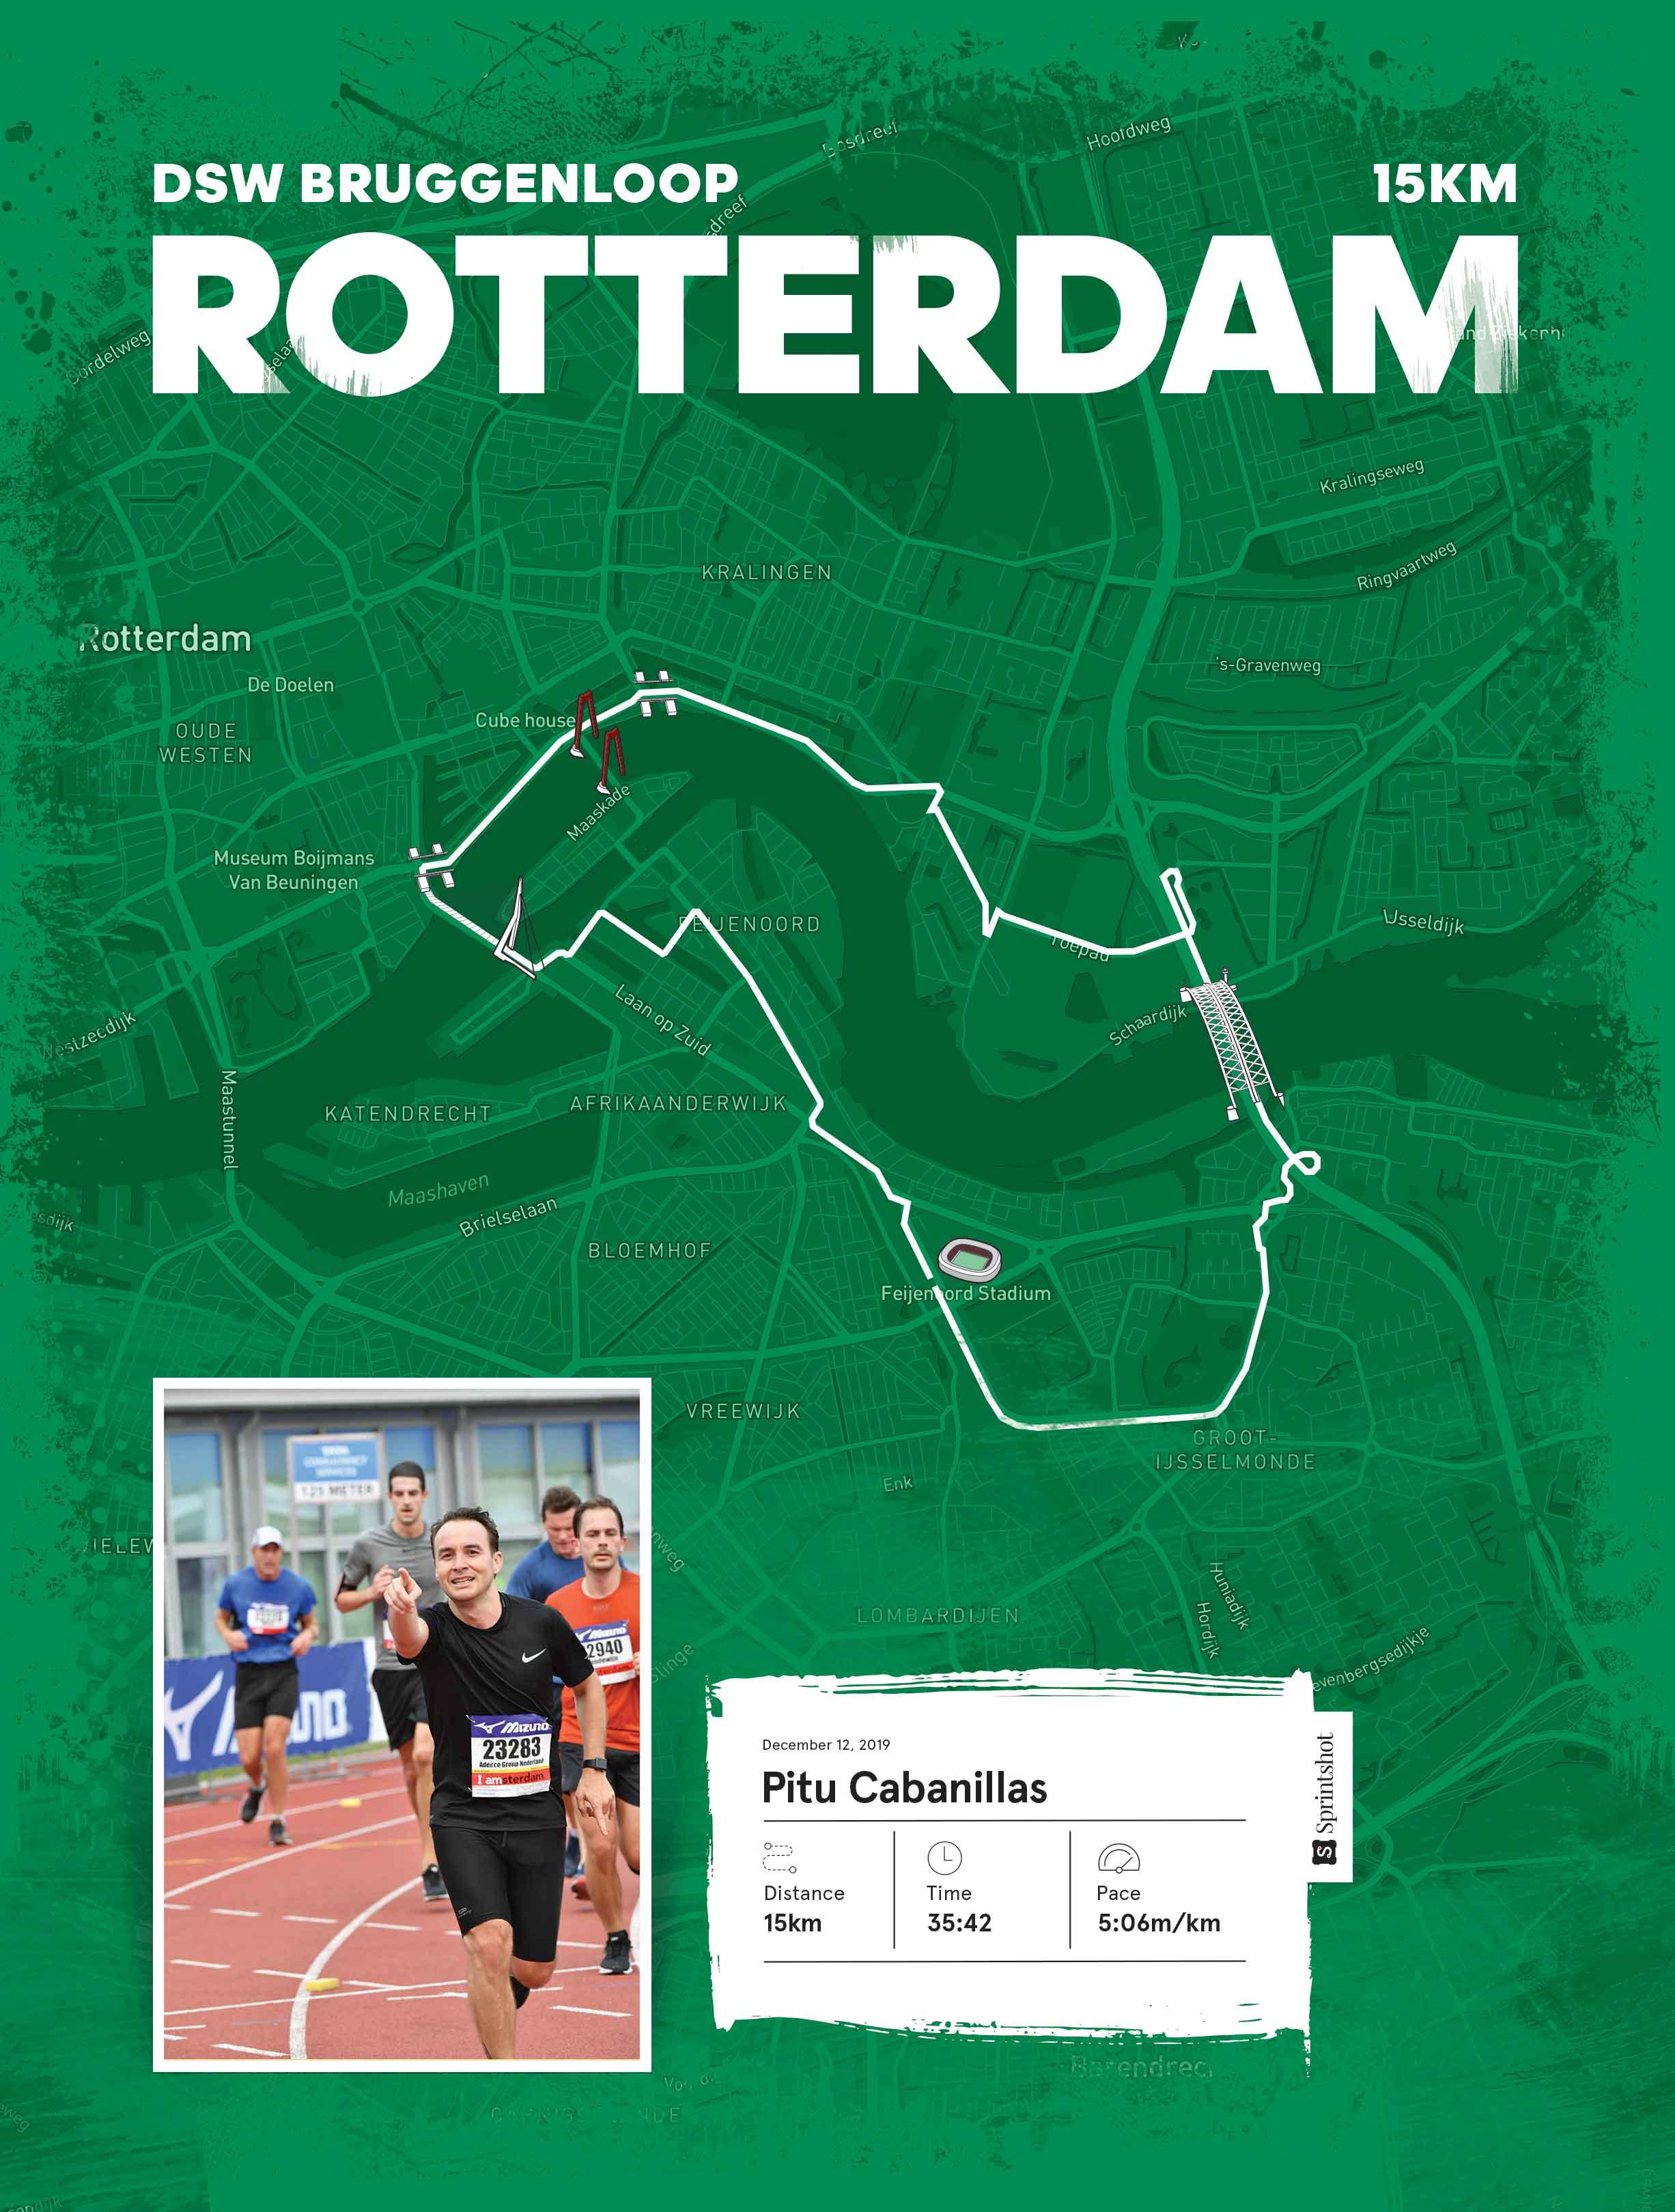 sprintshot-running-create-posters-dswbruggenloop-rotterdam